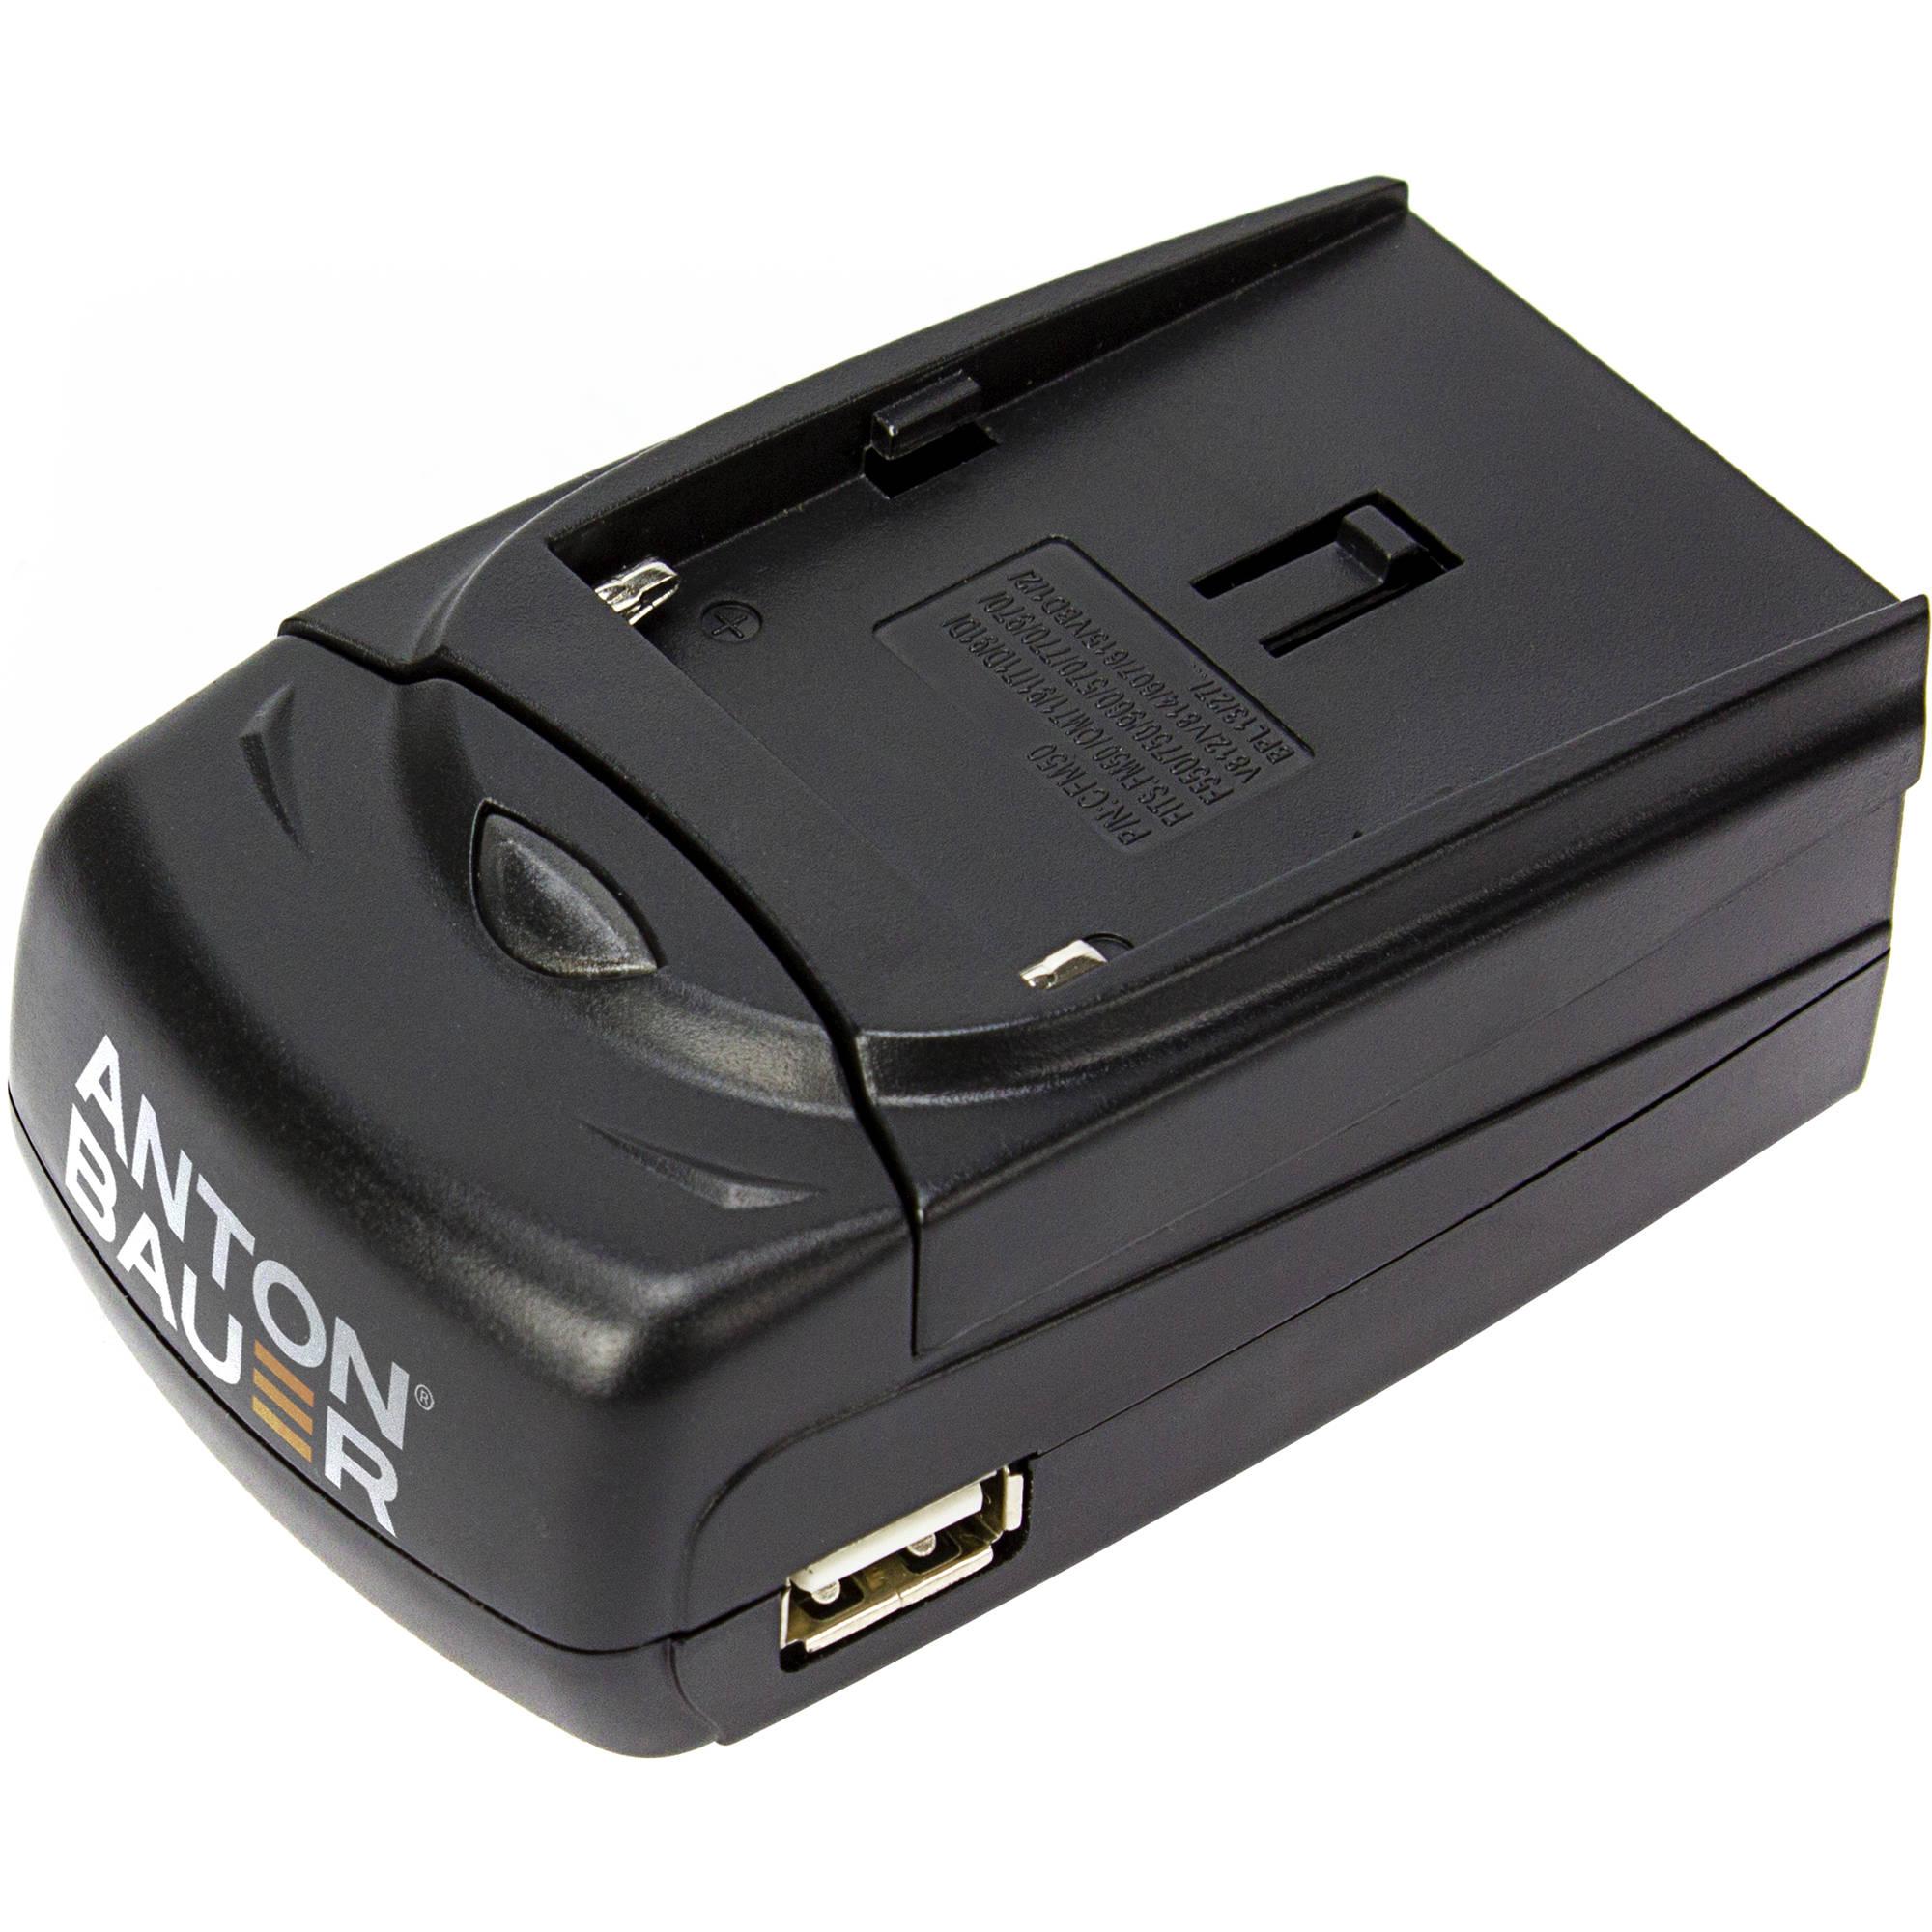 saada halvalla super erikoisuuksia klassinen istuvuus Anton Bauer Single Charger with US Plug for L-Series Batteries